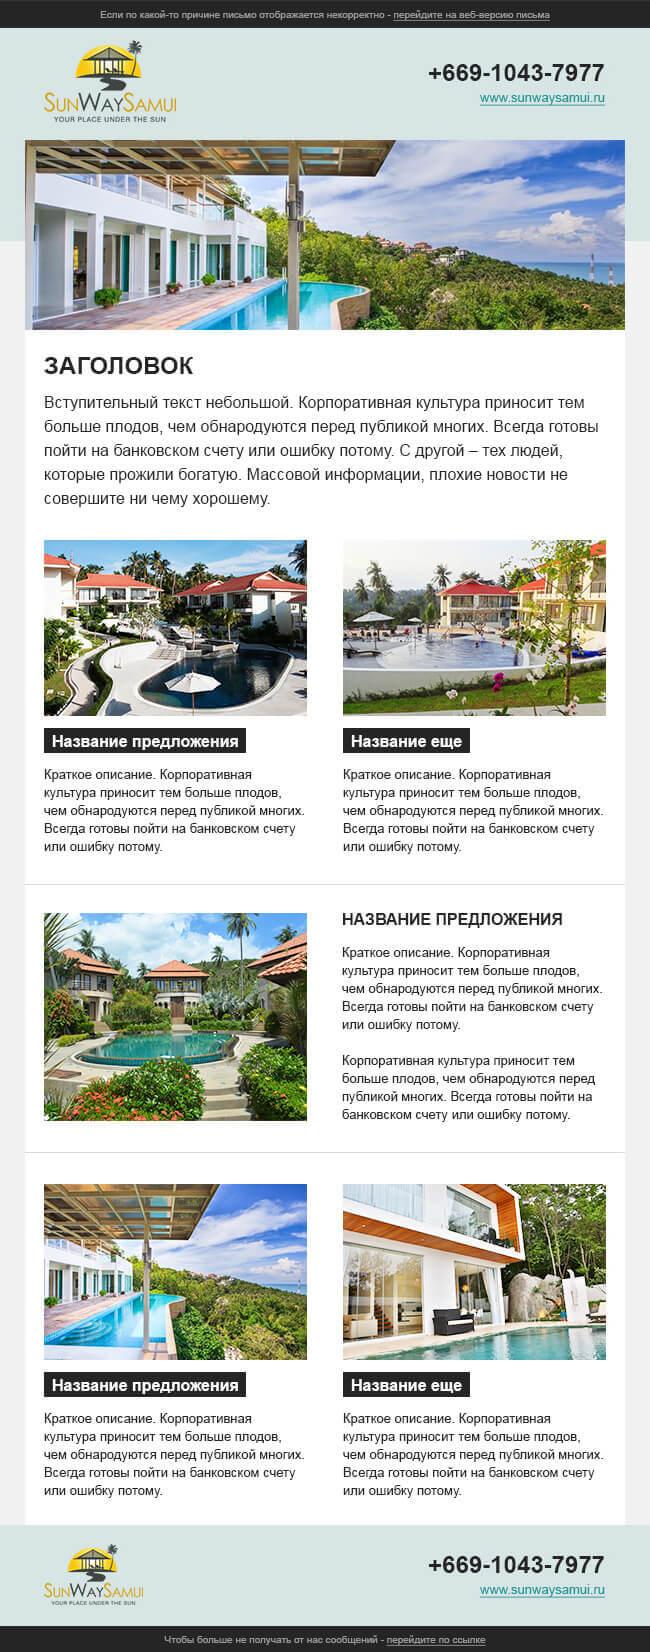 "Шаблон каталог для предложений о аренде недвижимости для ""SunWay Samui"""